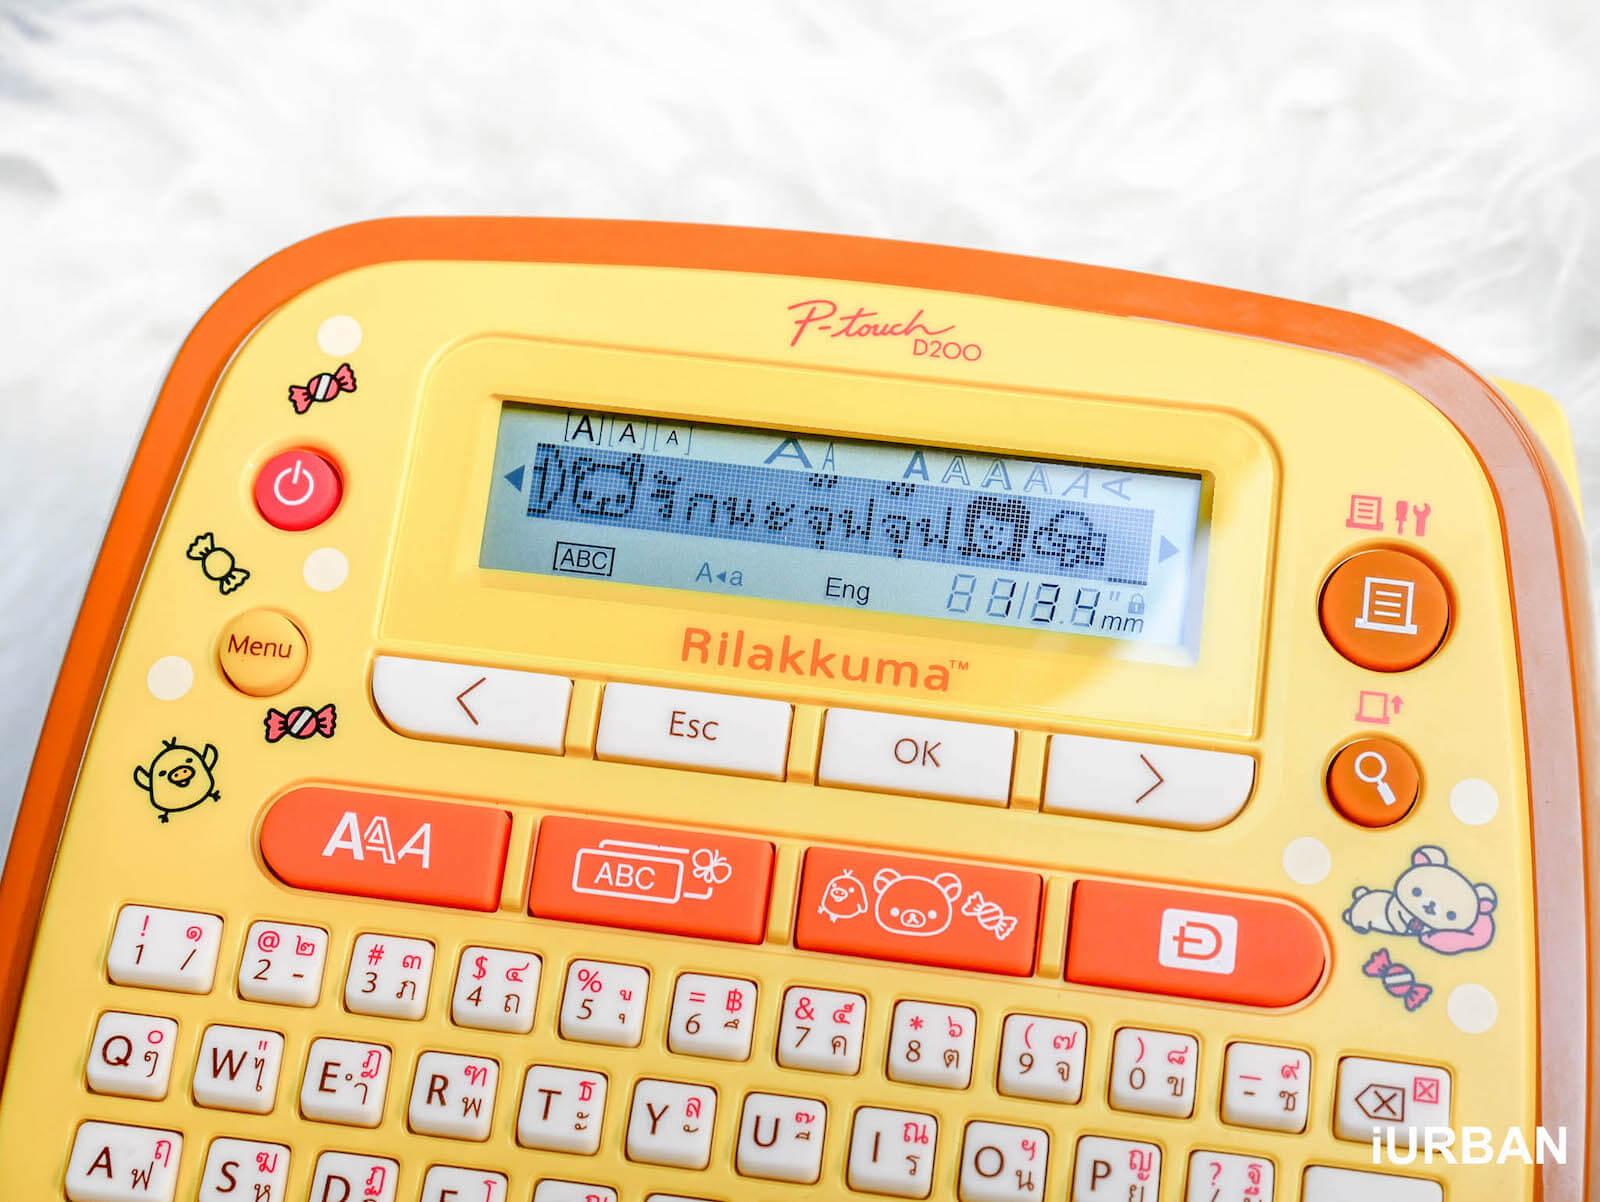 %name 14 วิธีเปลี่ยนเป็นสาวครีเอทีฟด้วยเครื่องพิมพ์ฉลาก Rilakkuma Label Printer by Brother